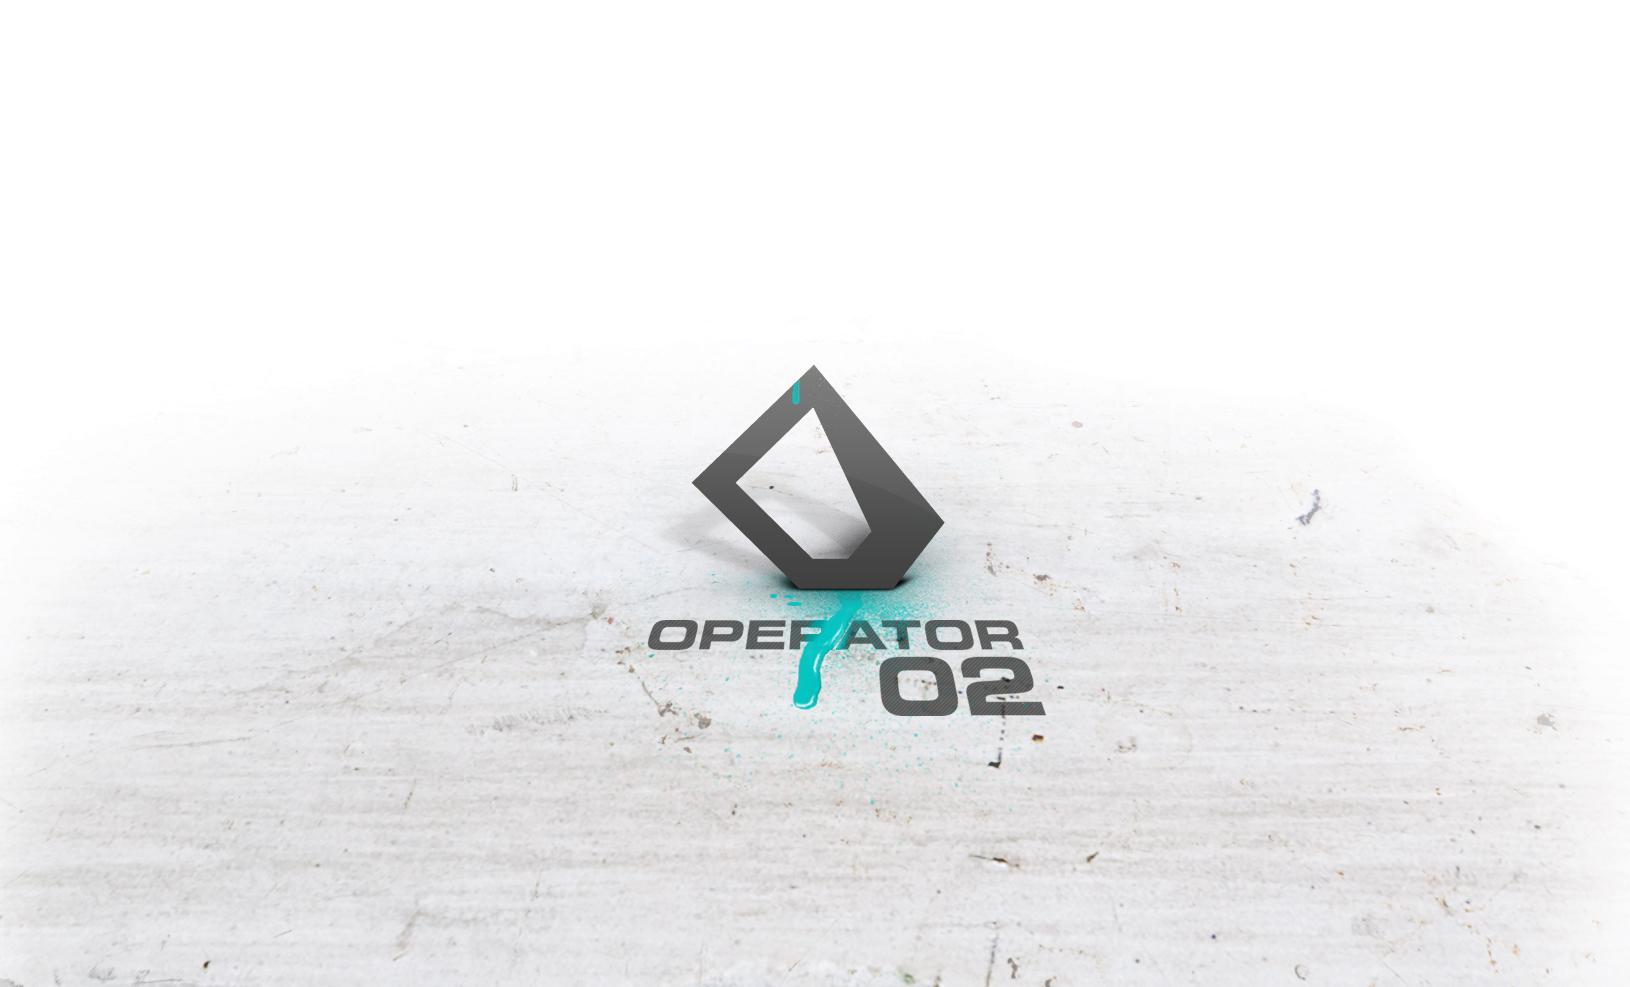 operator 02 logotype by davelancel